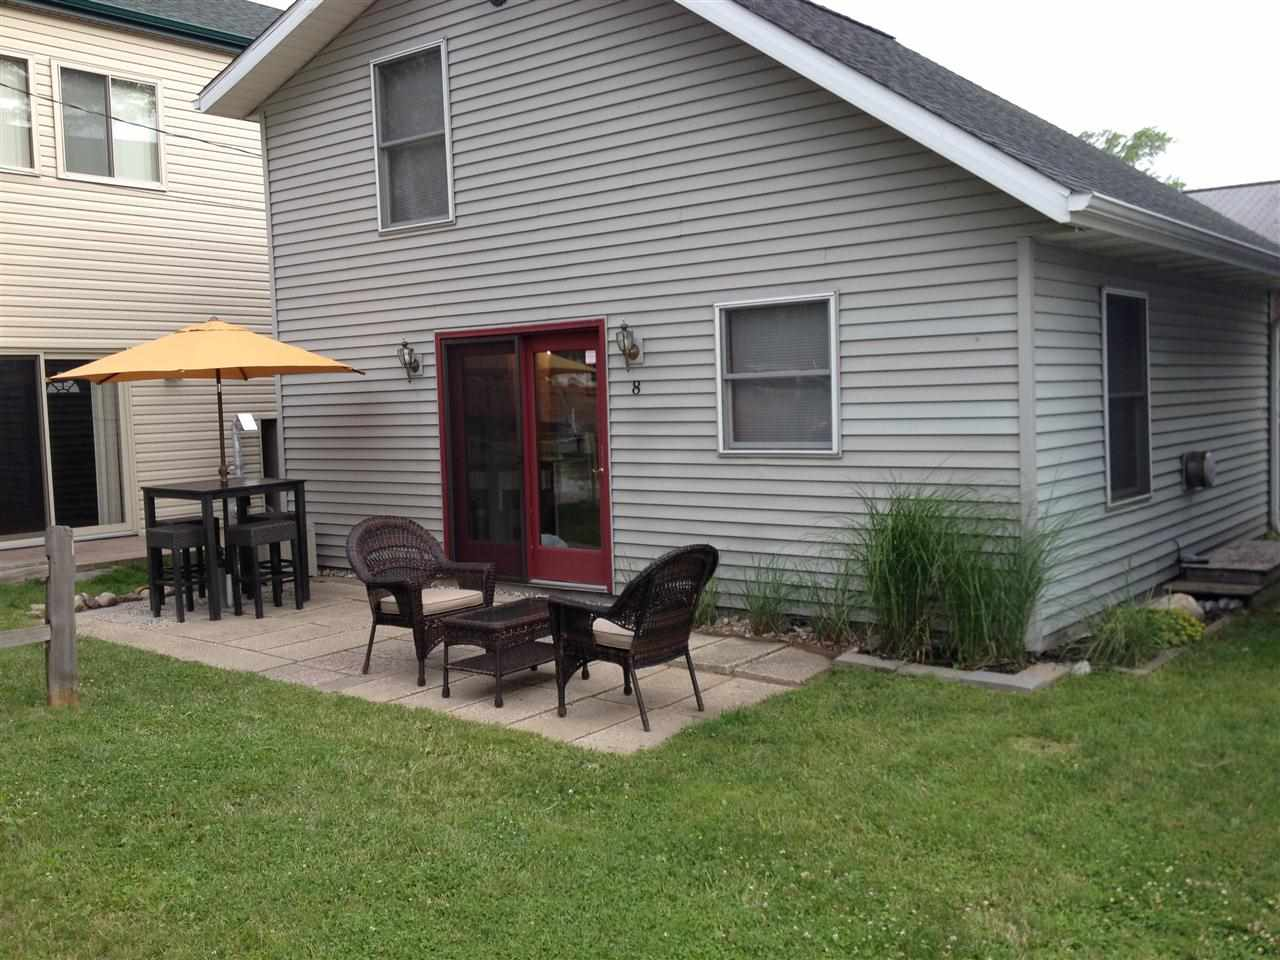 Real Estate for Sale, ListingId: 33737467, Houghton Lake,MI48629